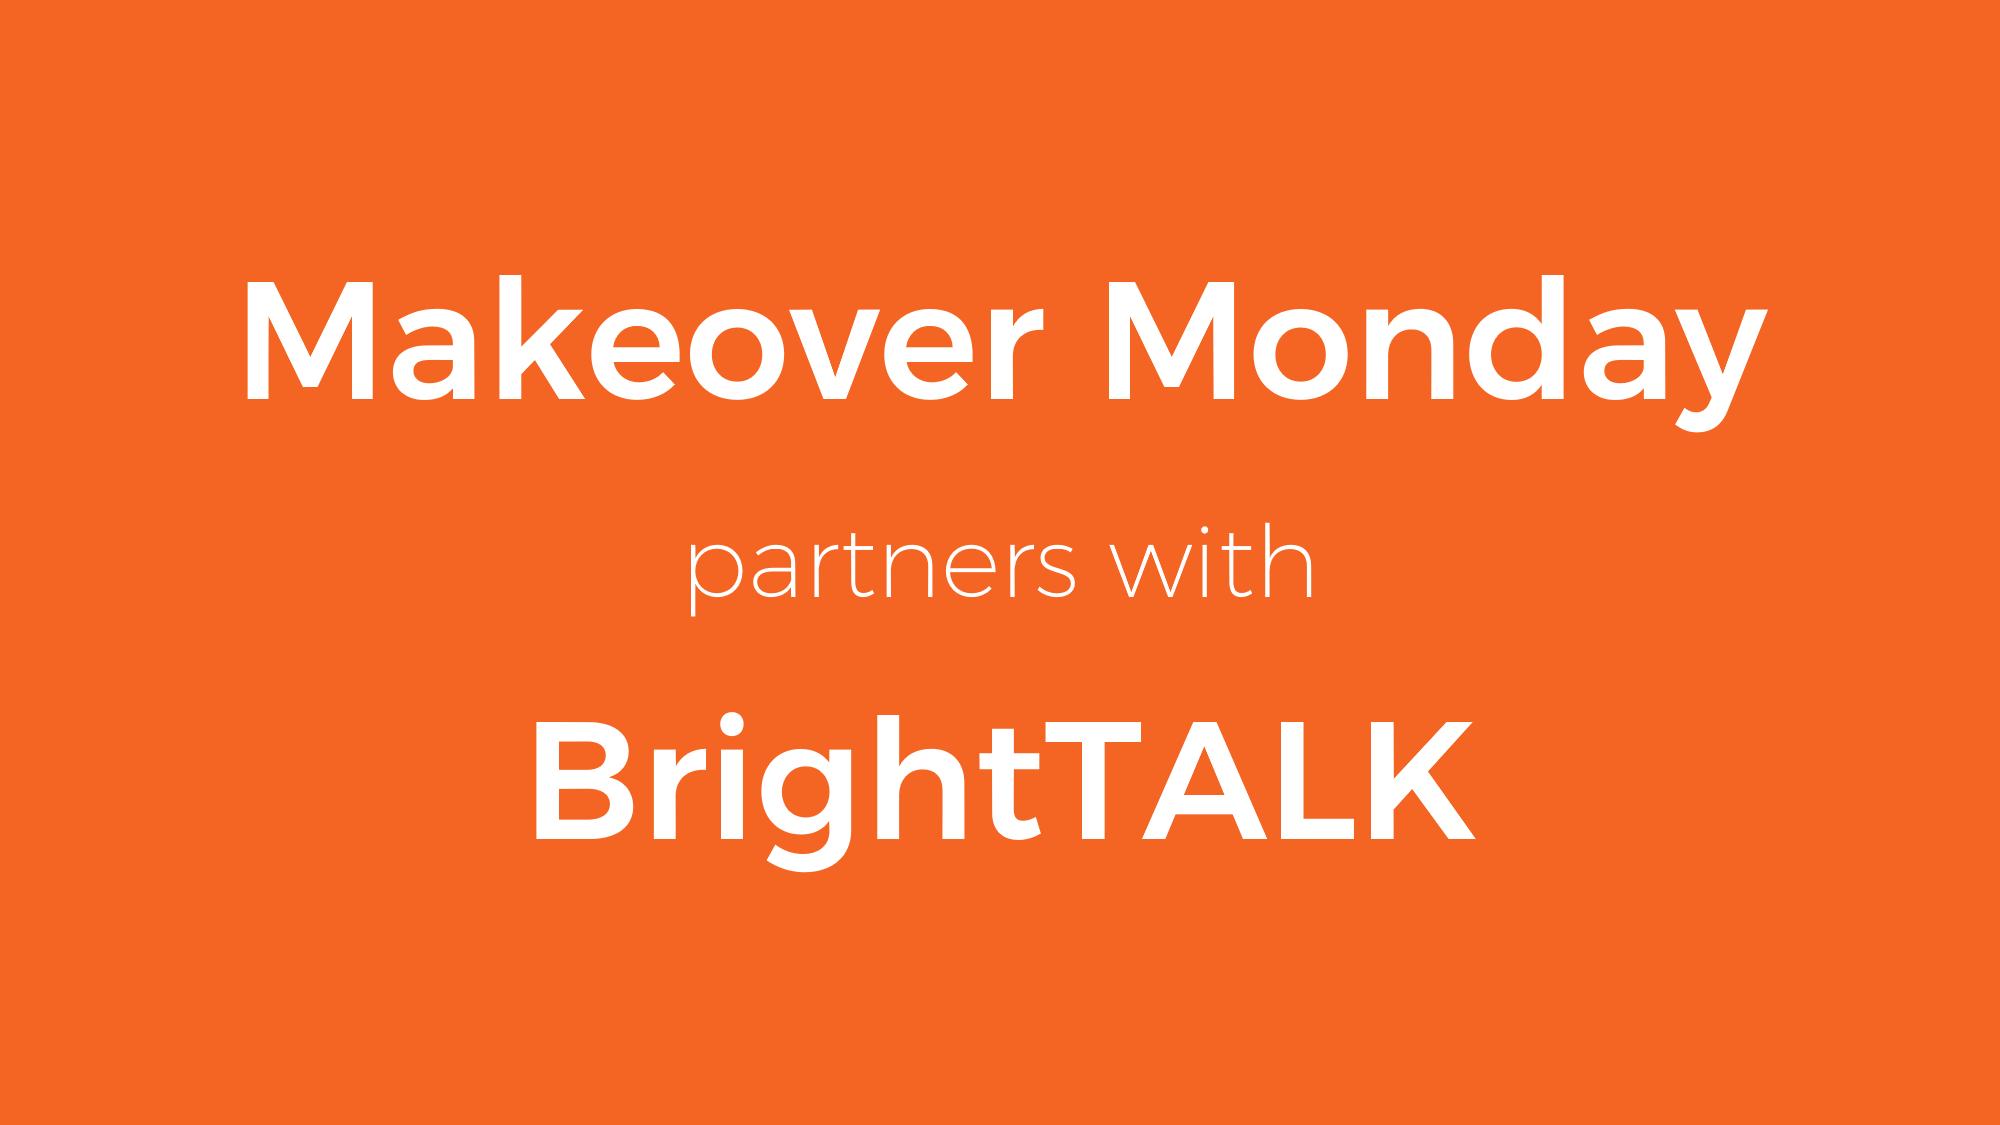 Makeover Monday becomes a BrightTALK Partner